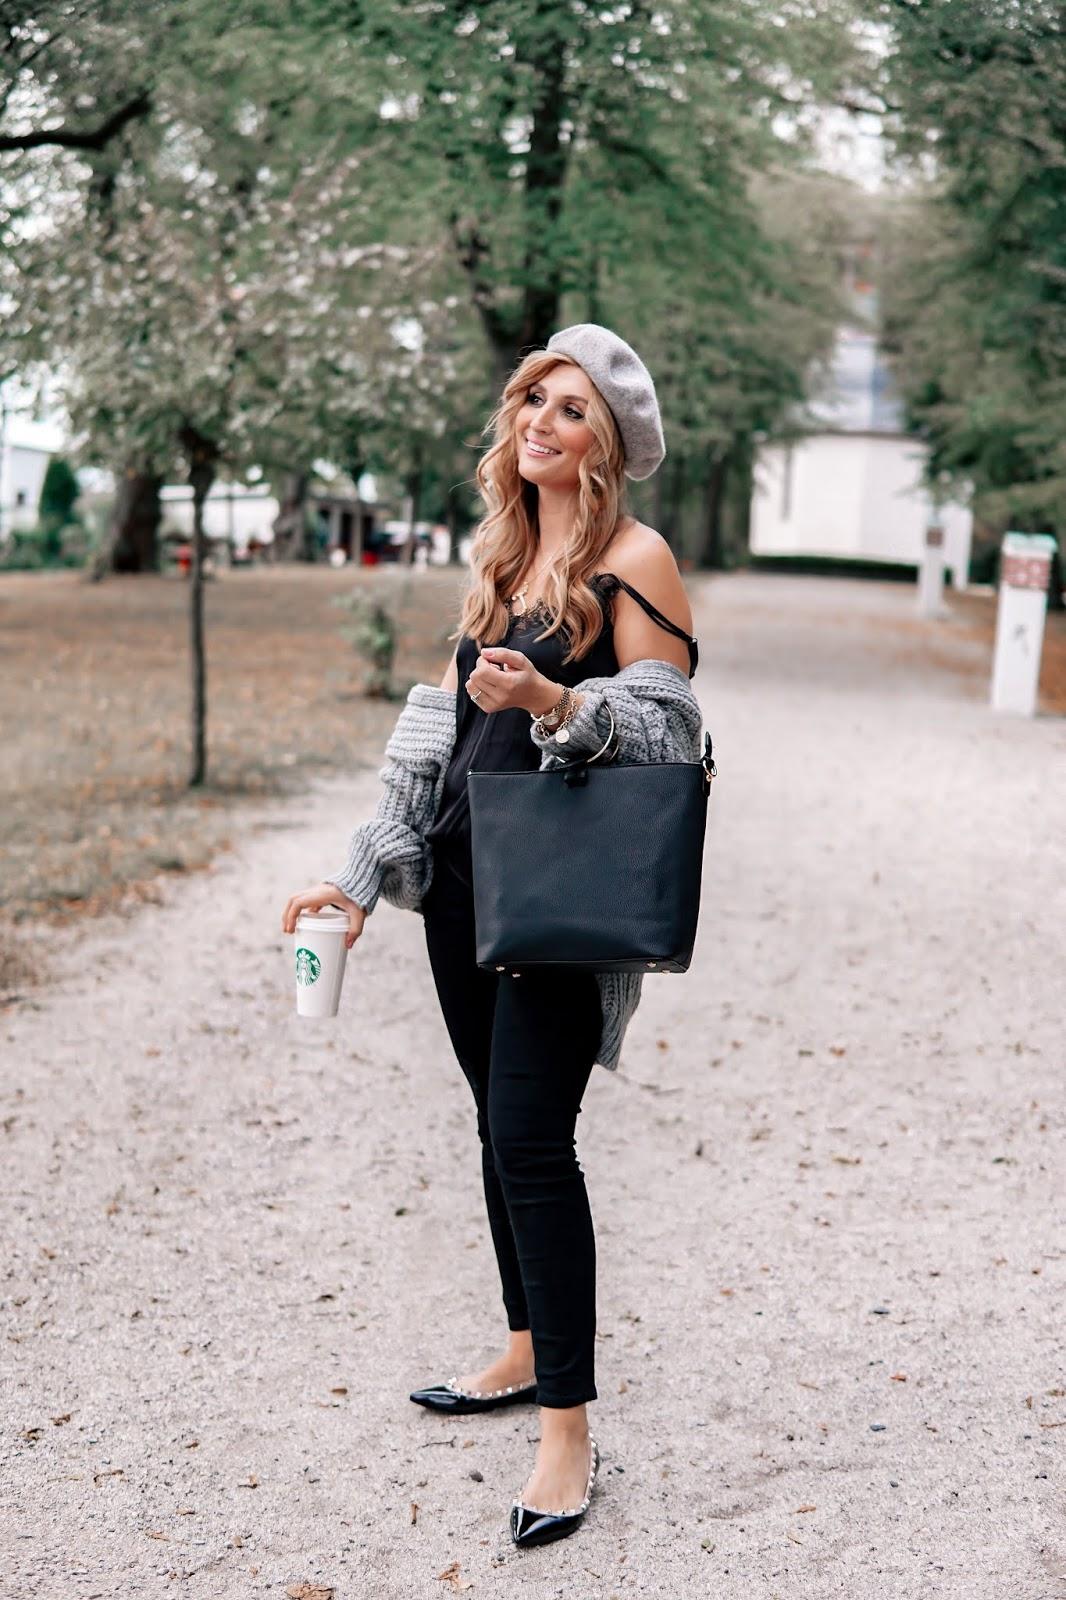 baskenmütze-grau-graue-baskenmütze-grauer-cardigan-schwarze-spitze-nieten-schuhe-fashionstylebyjohanna (4)_1